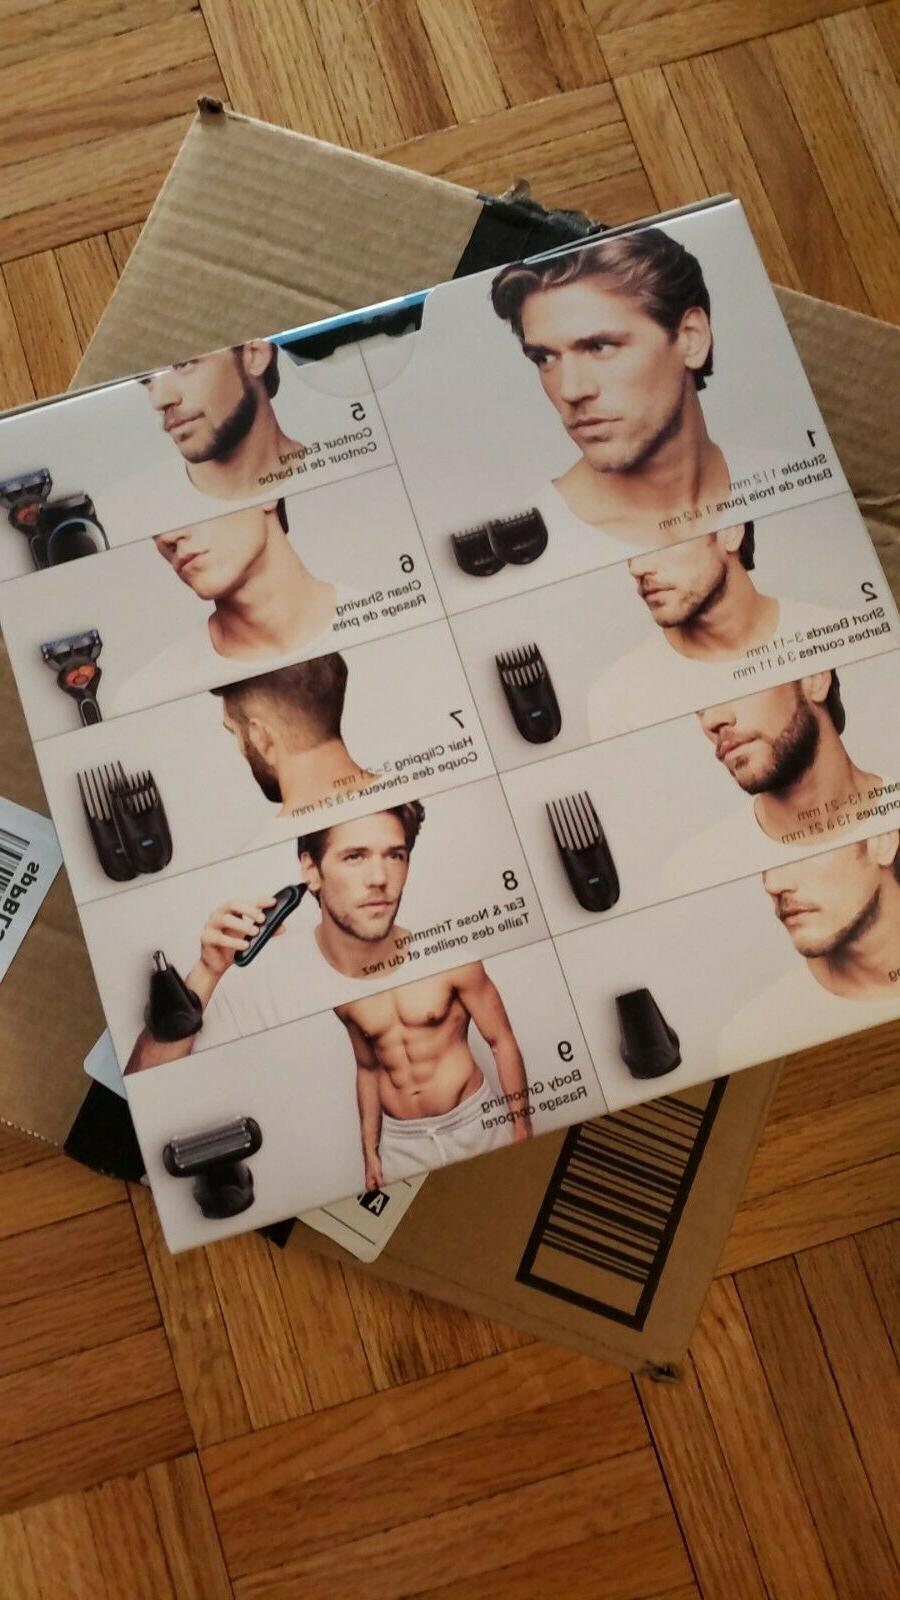 Braun 9-in-one men's styling